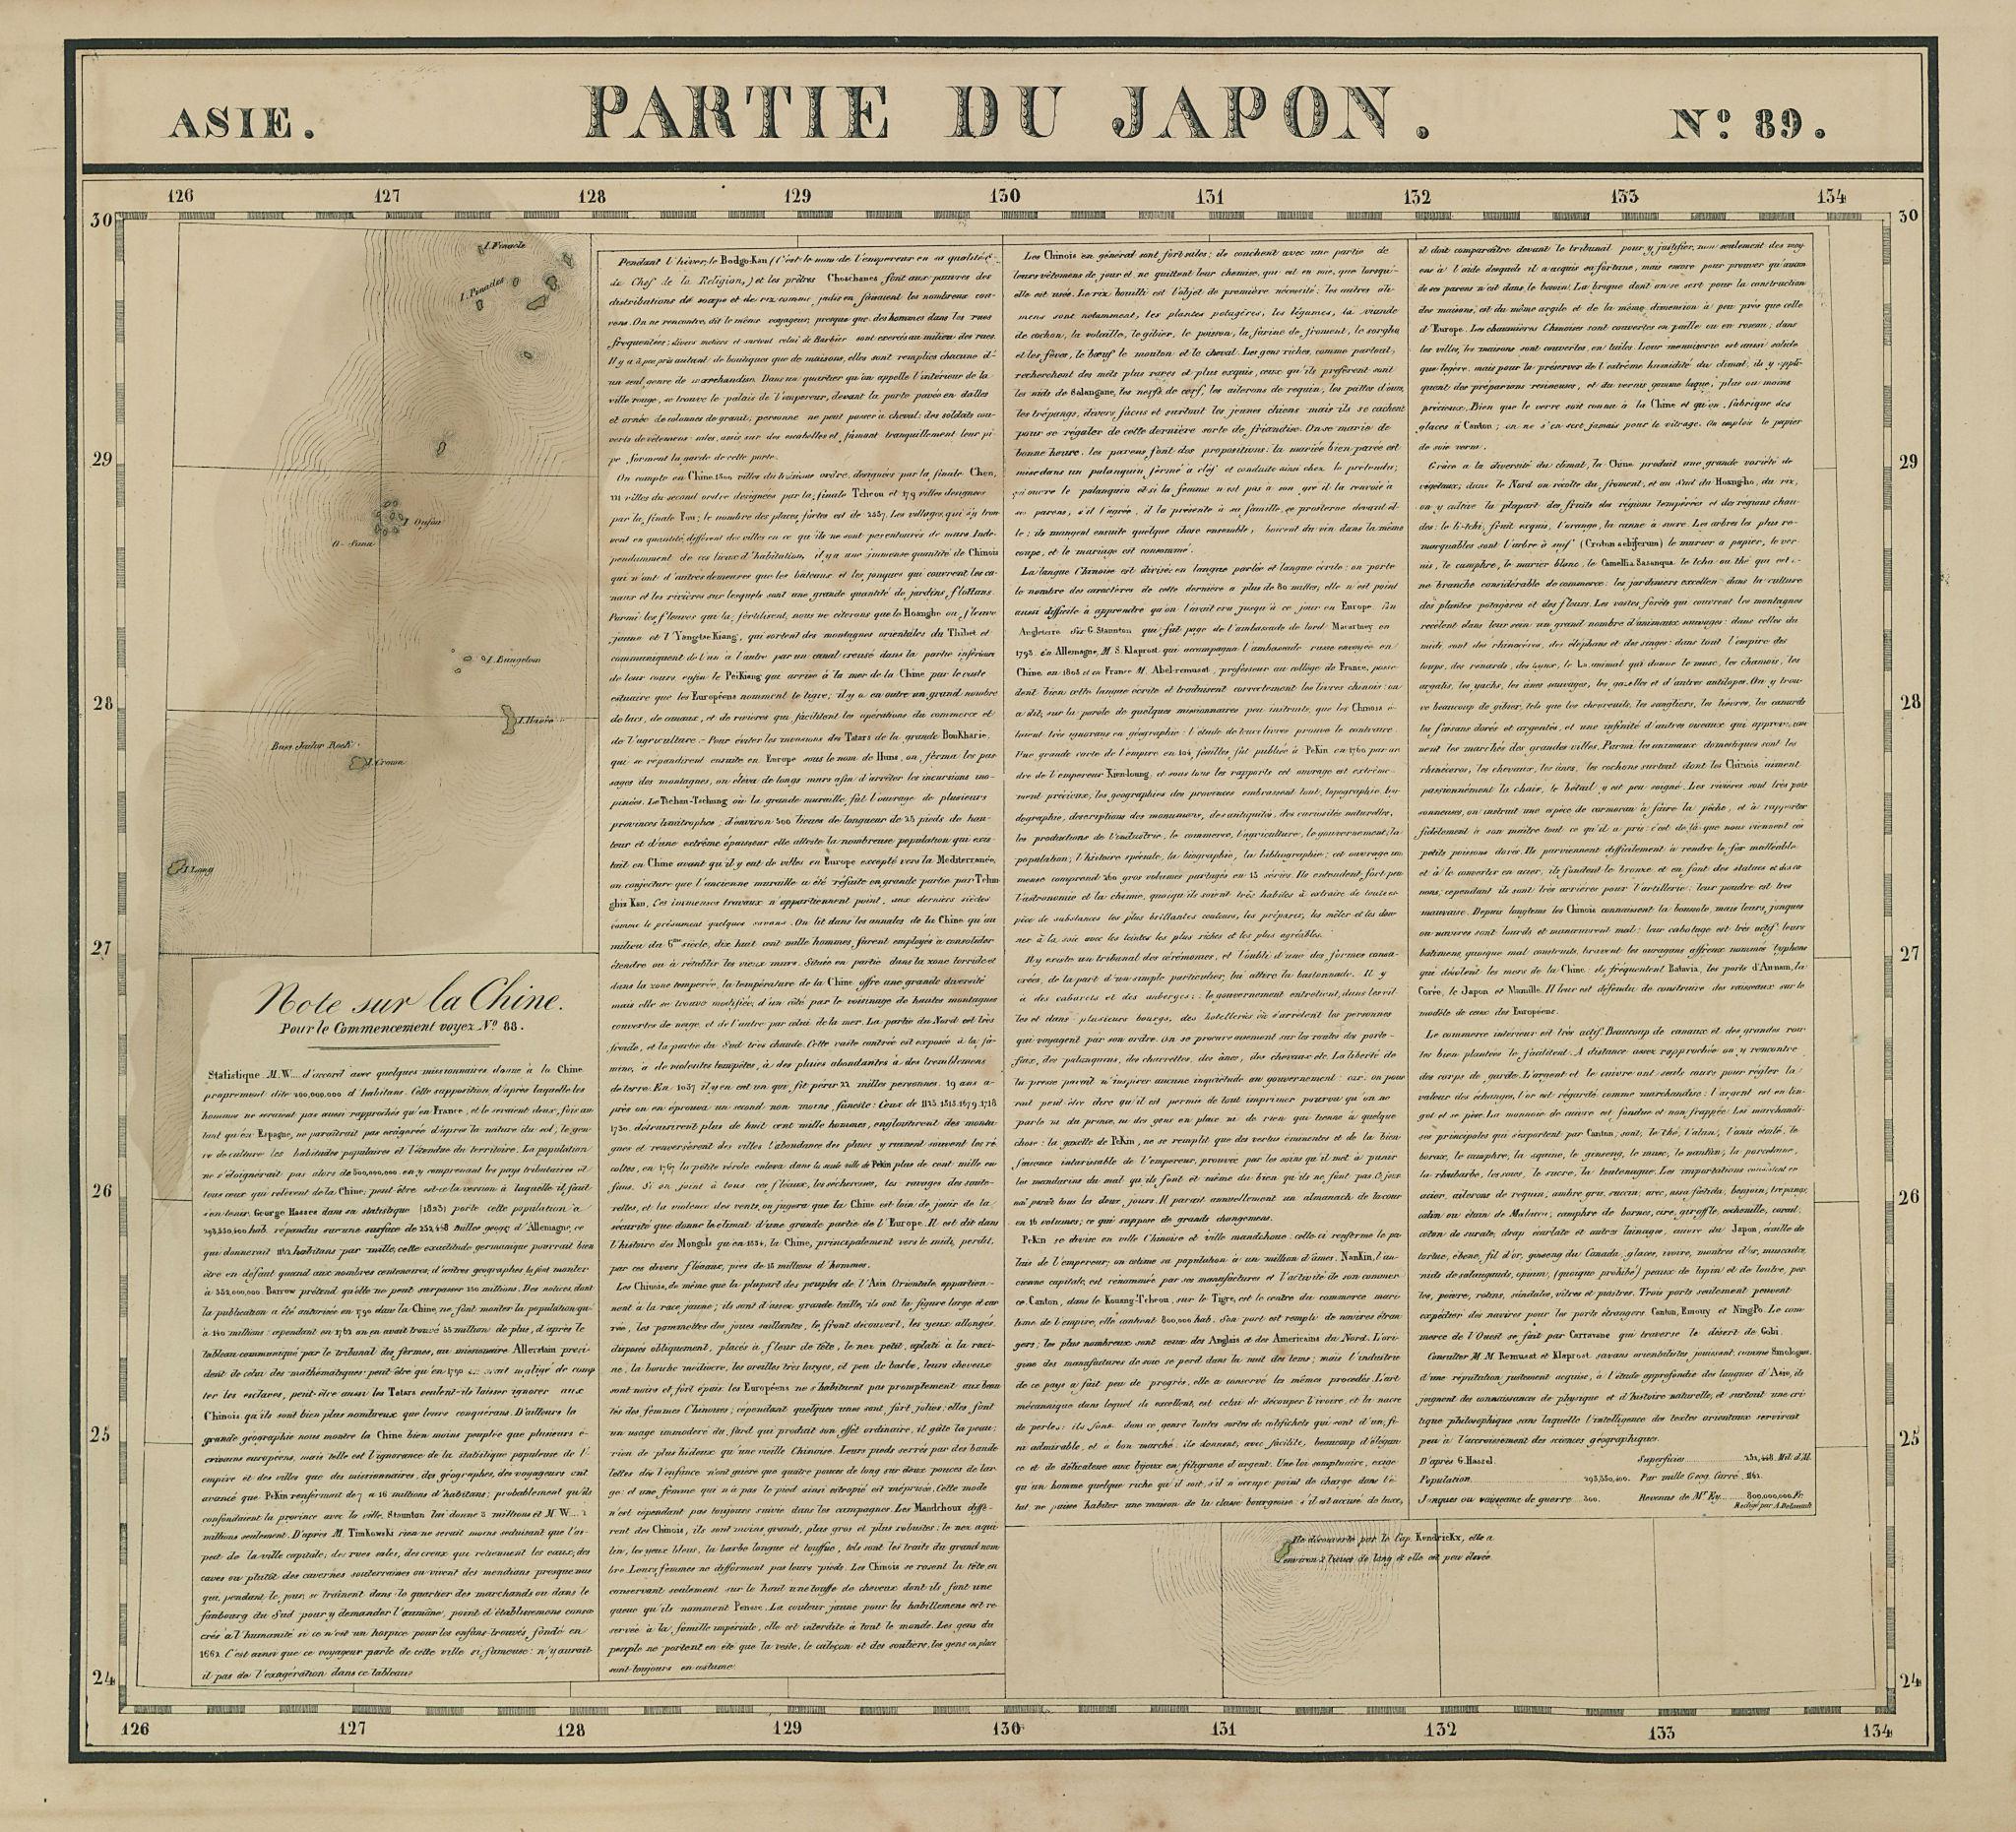 Asie. Partie du Japon #89 Amami/Ryukyu Islands Japan. VANDERMAELEN 1827 map